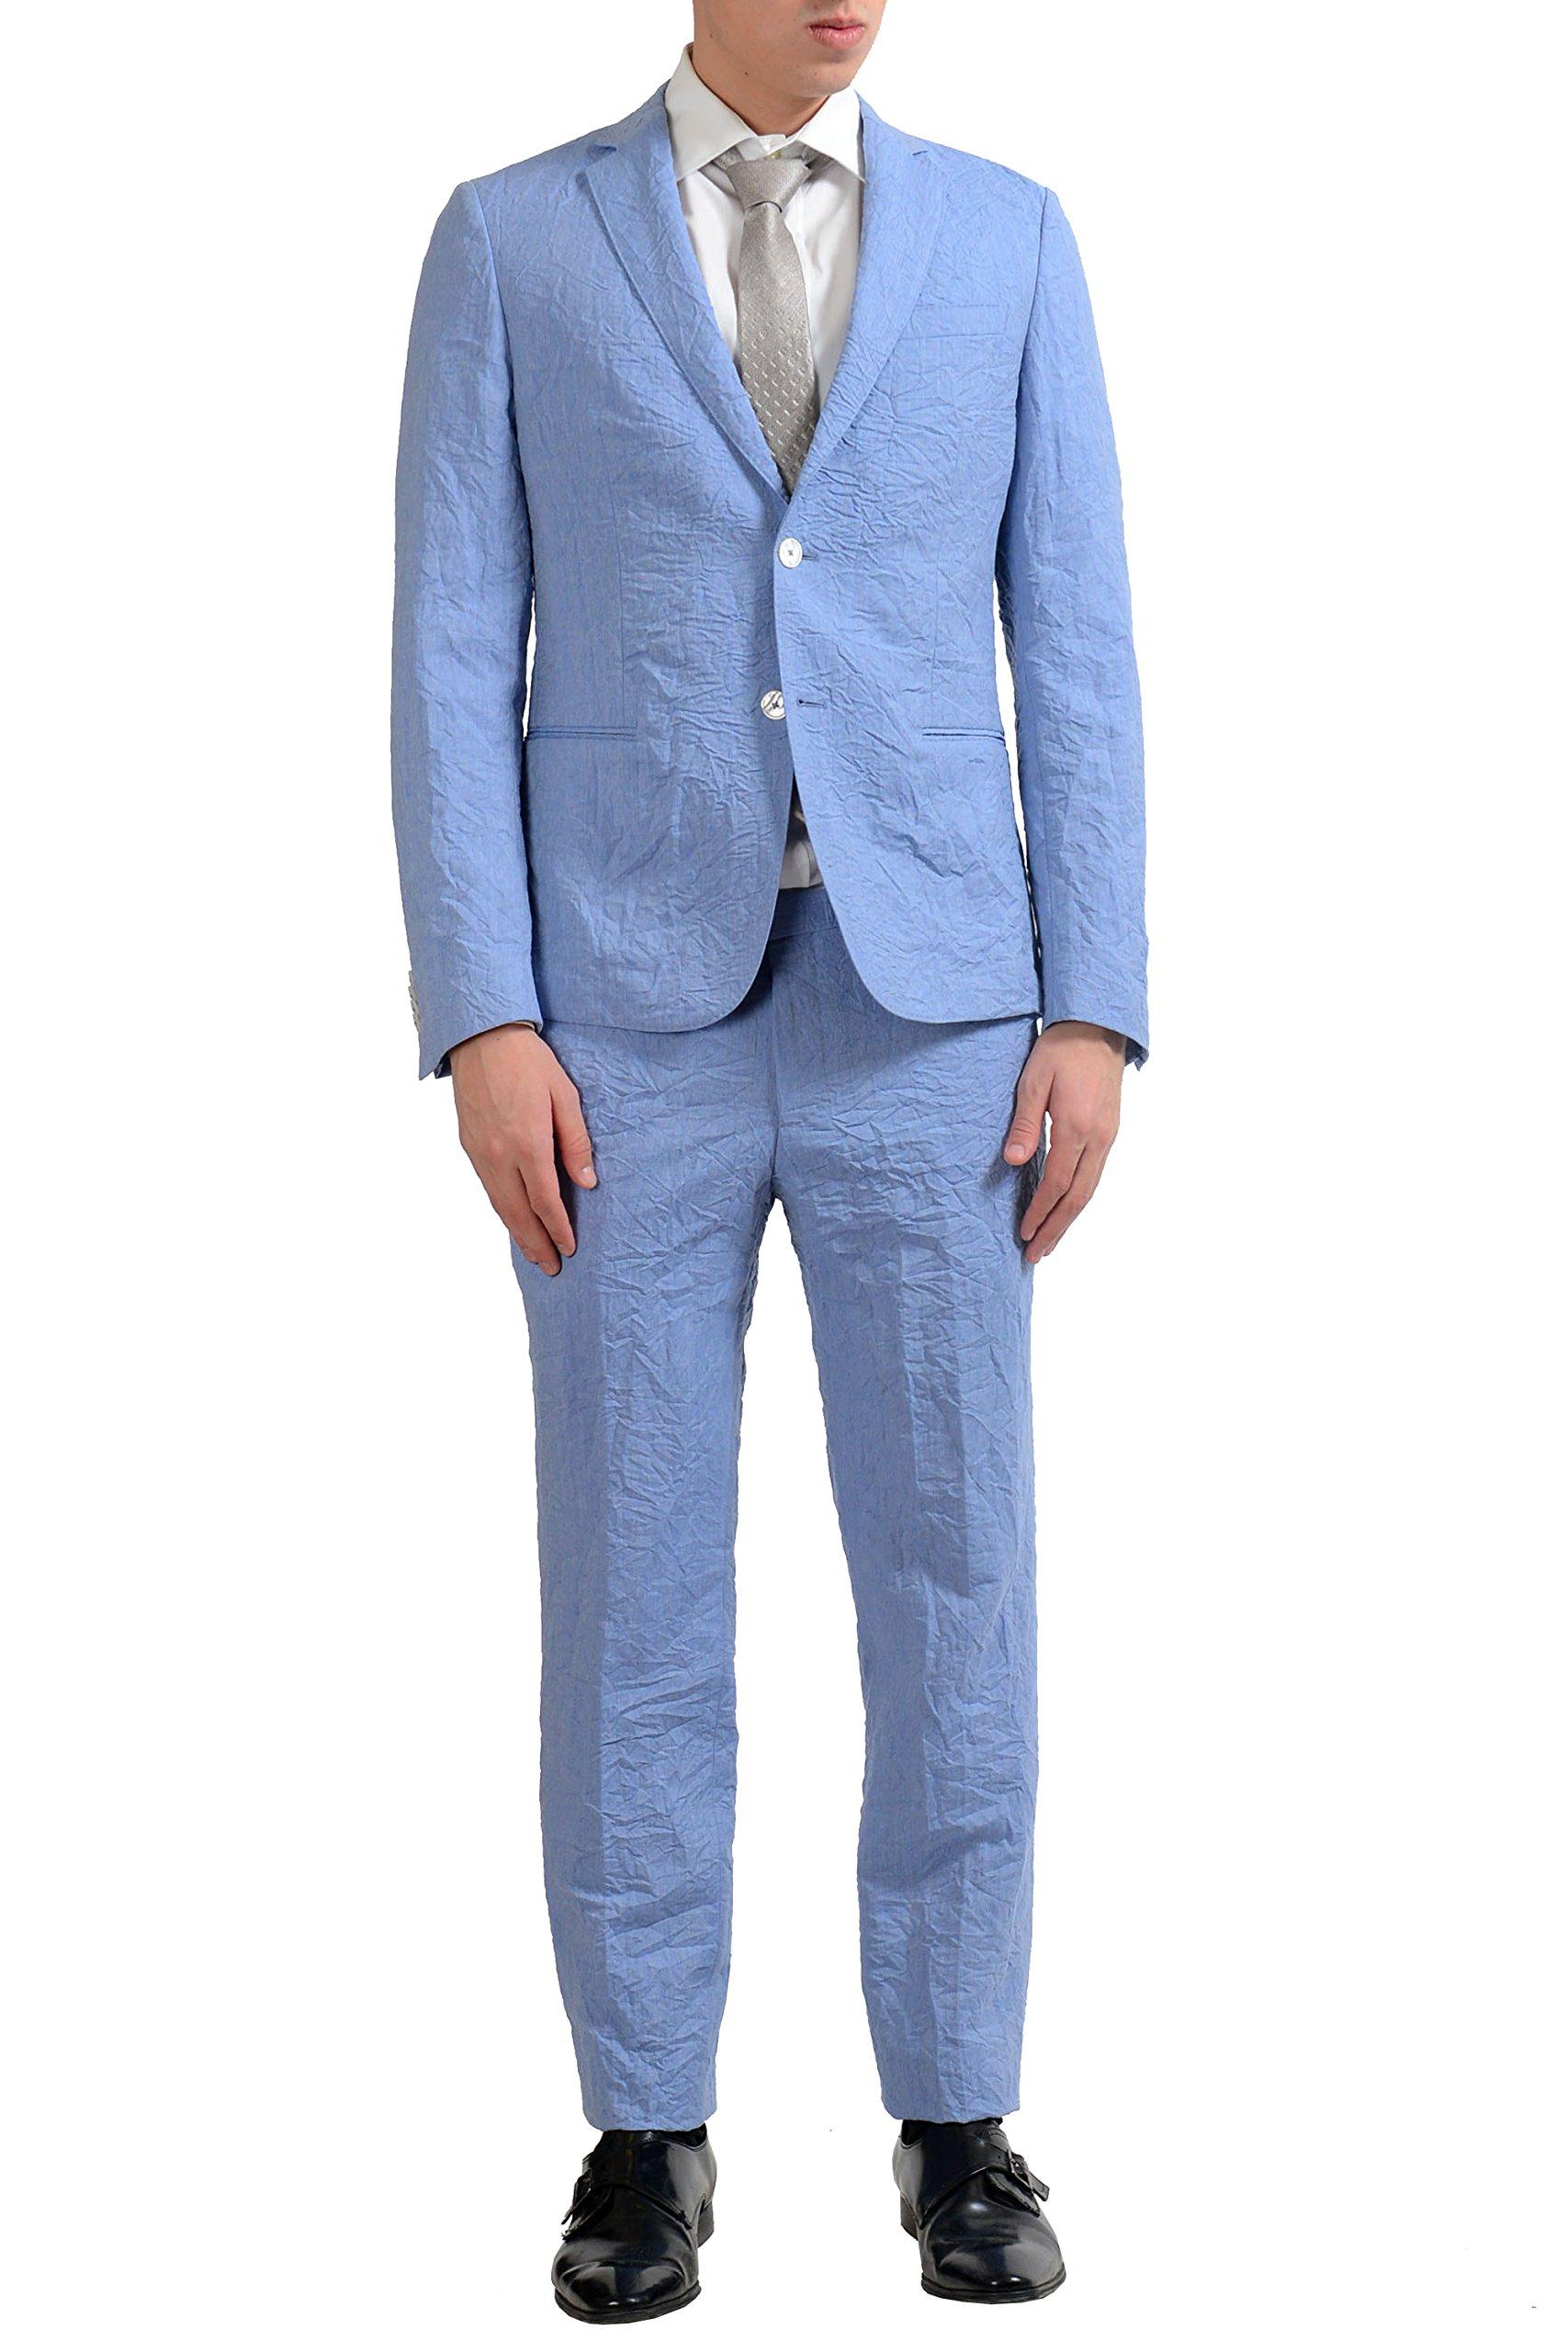 Hugo Boss ''Nivan/Benno1'' Men's Linen Wool Travel Two Button Suit US 38R IT 48R